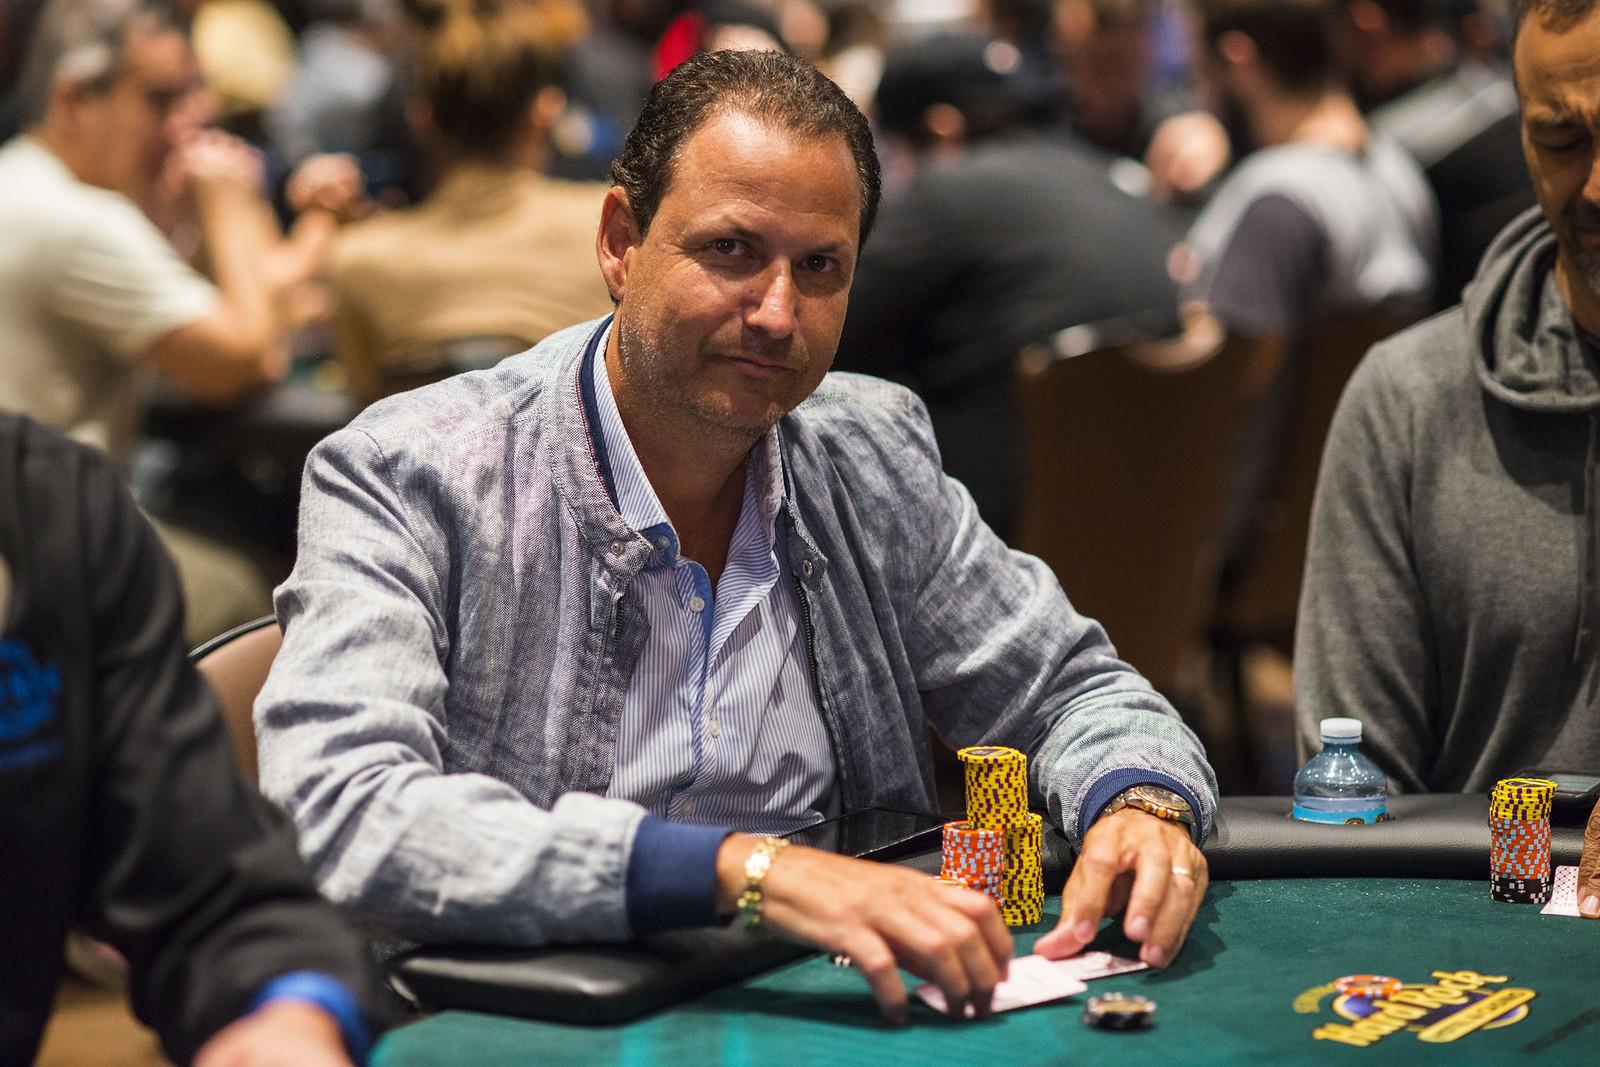 David castranova poker tournament